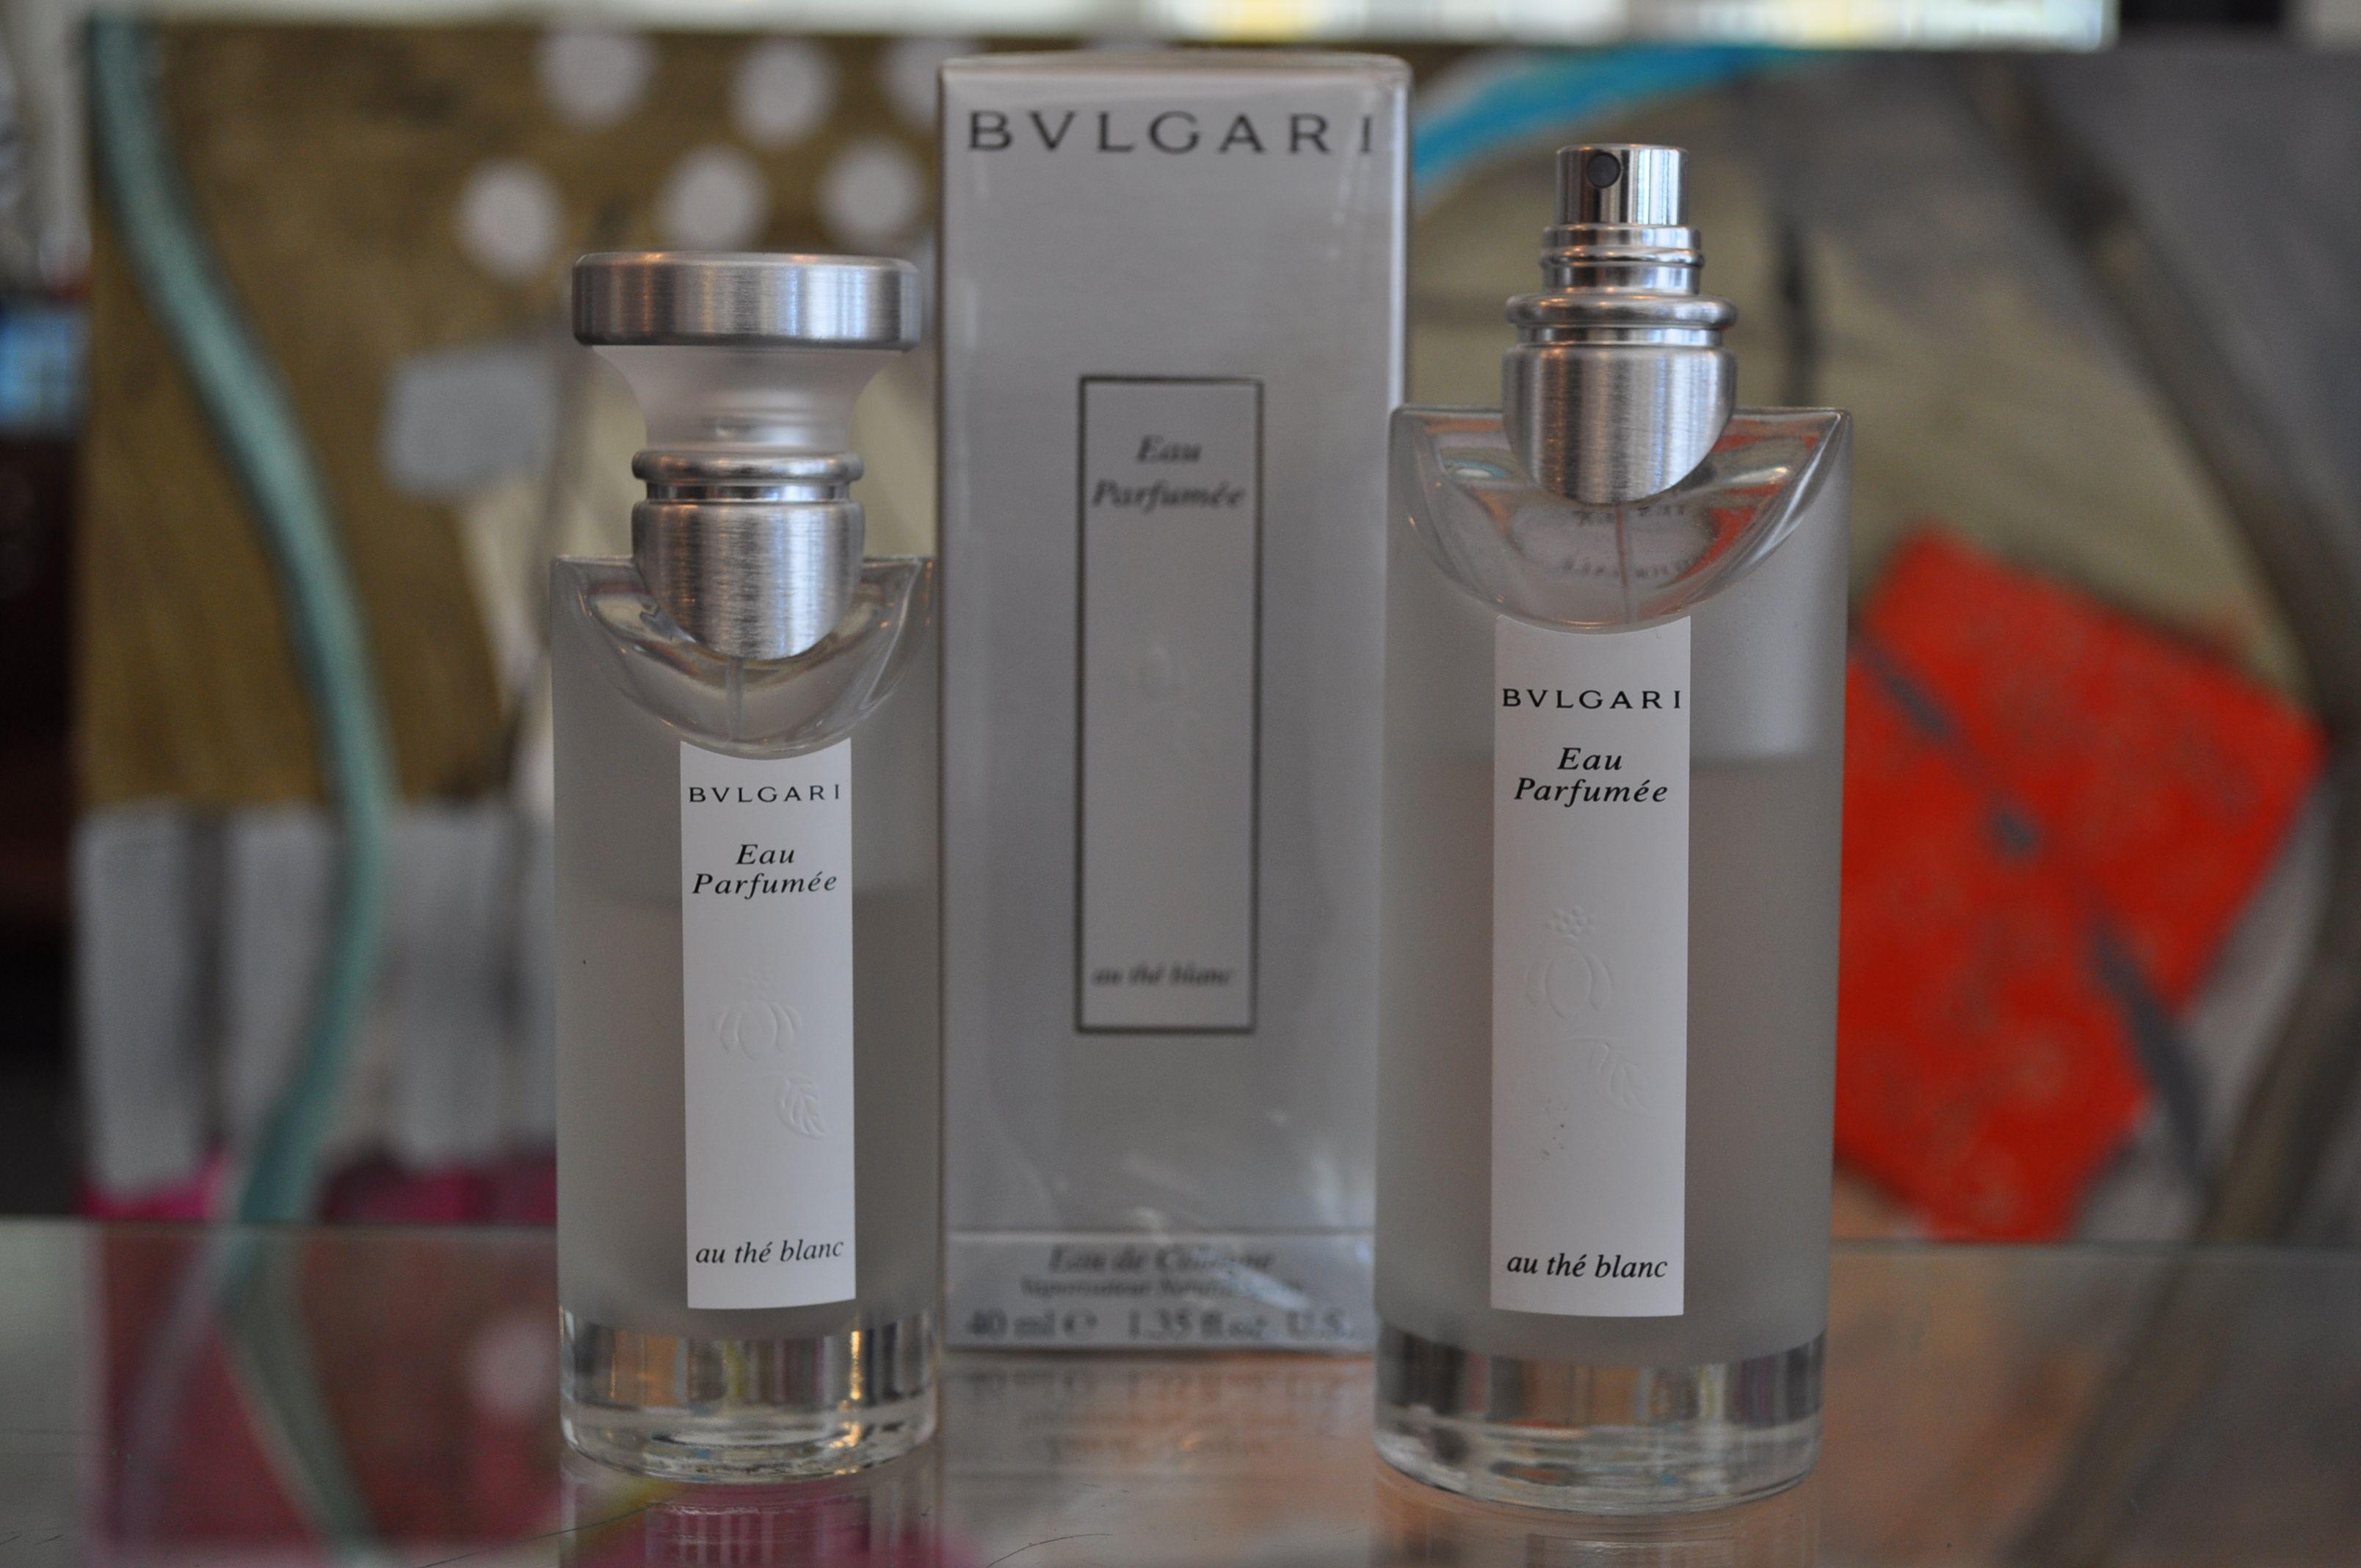 Bulgari au thé blanc perfume sold at jewel toffier call